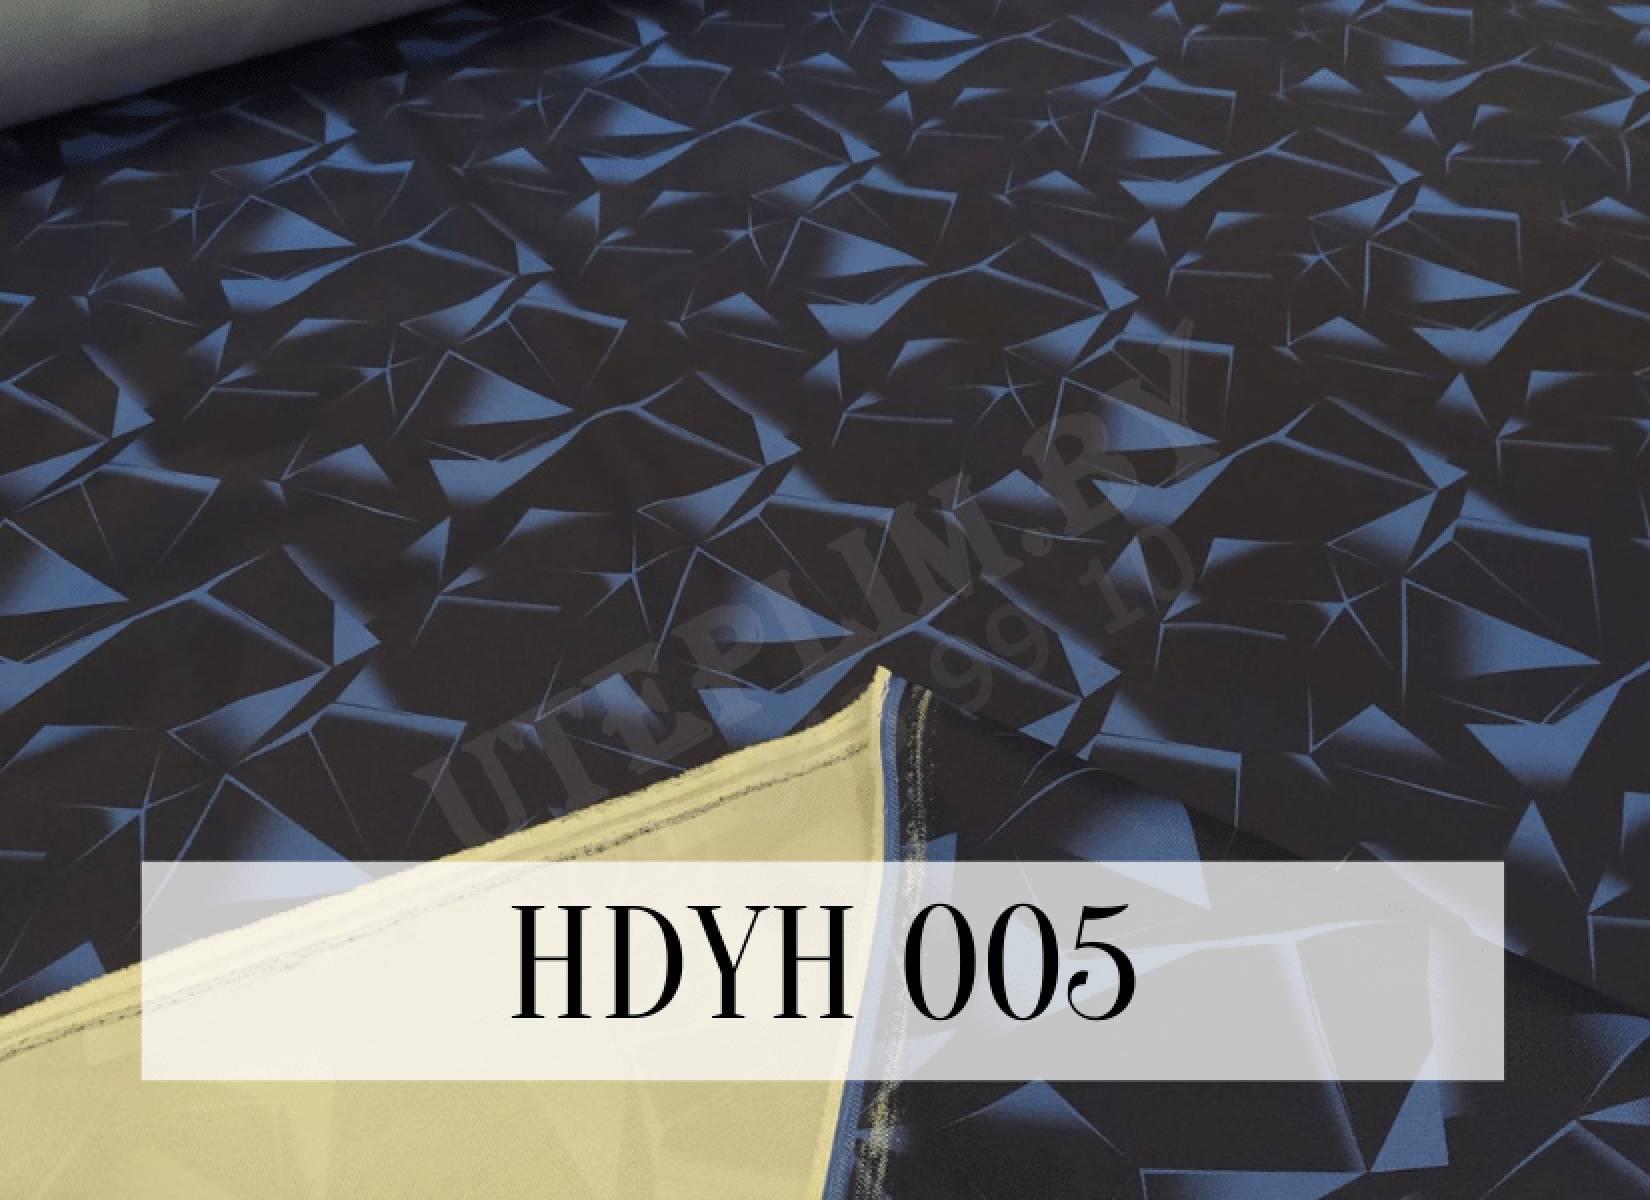 600д - HDYH 005